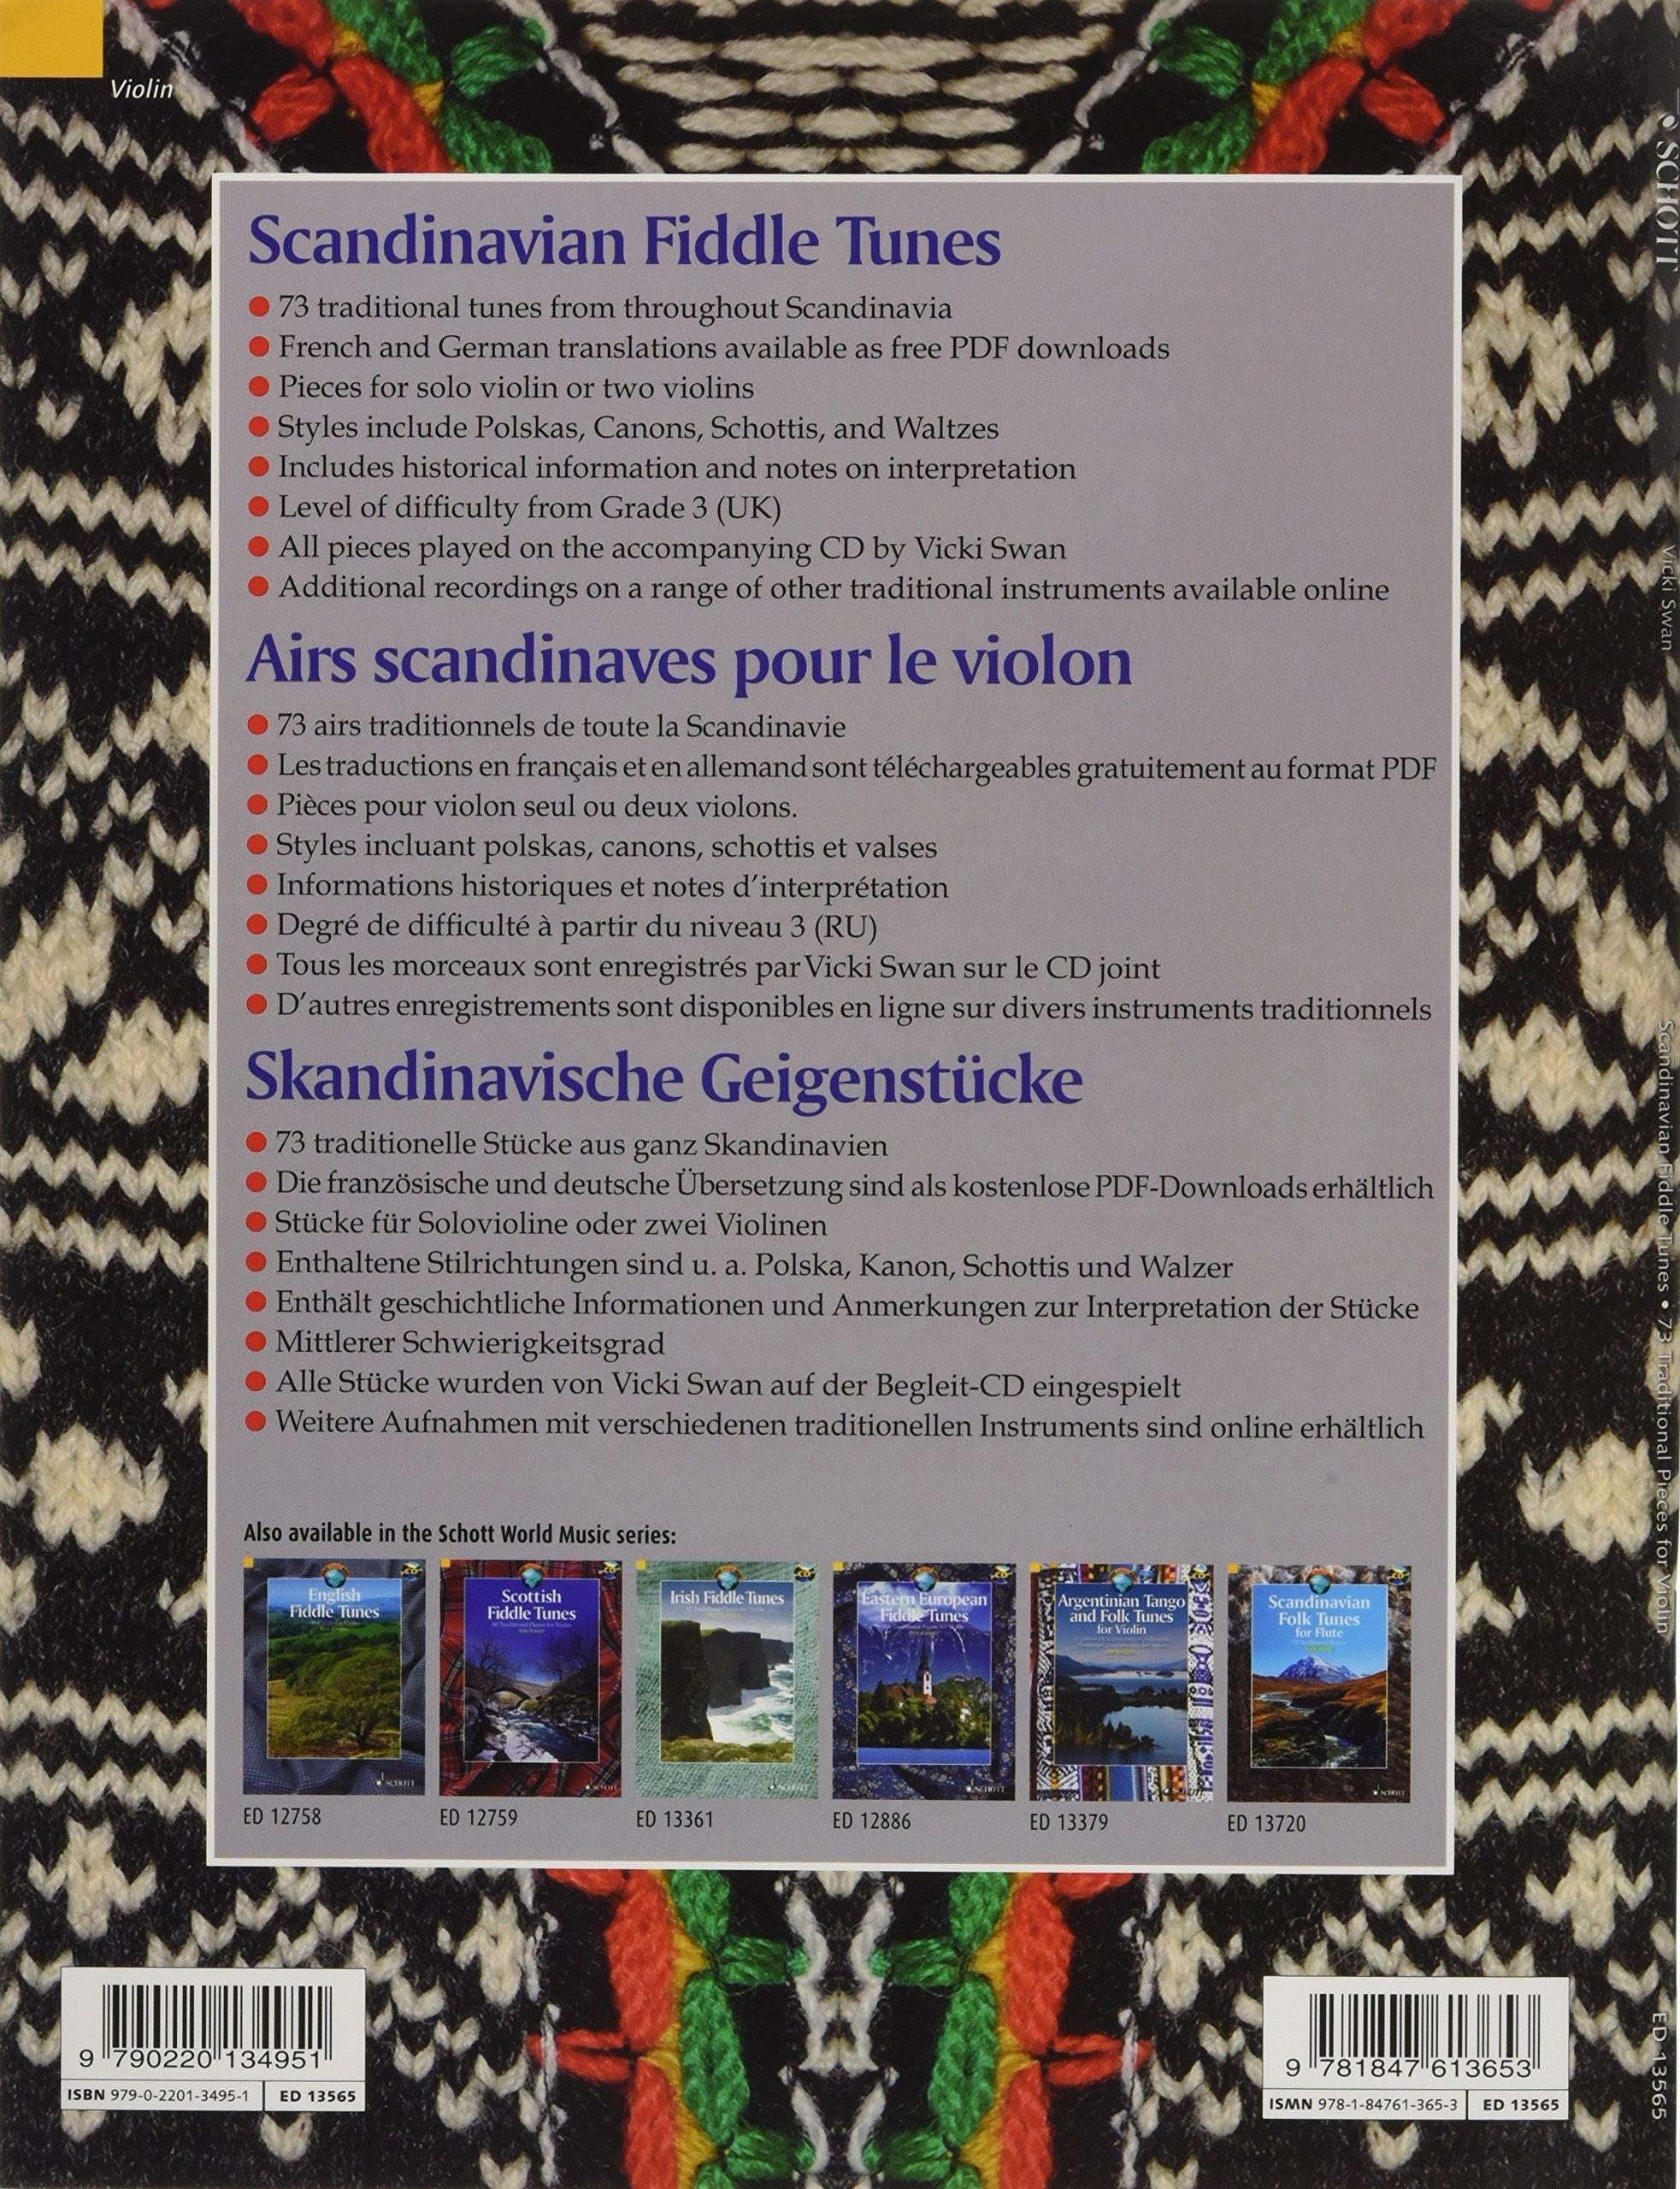 Scandinavian Fiddle Tunes 73 Pieces For Violin Argentine Tango Steps Diagram Companion Ebook 0888680041304 Vicki Swan Hal Leonard Corp Books